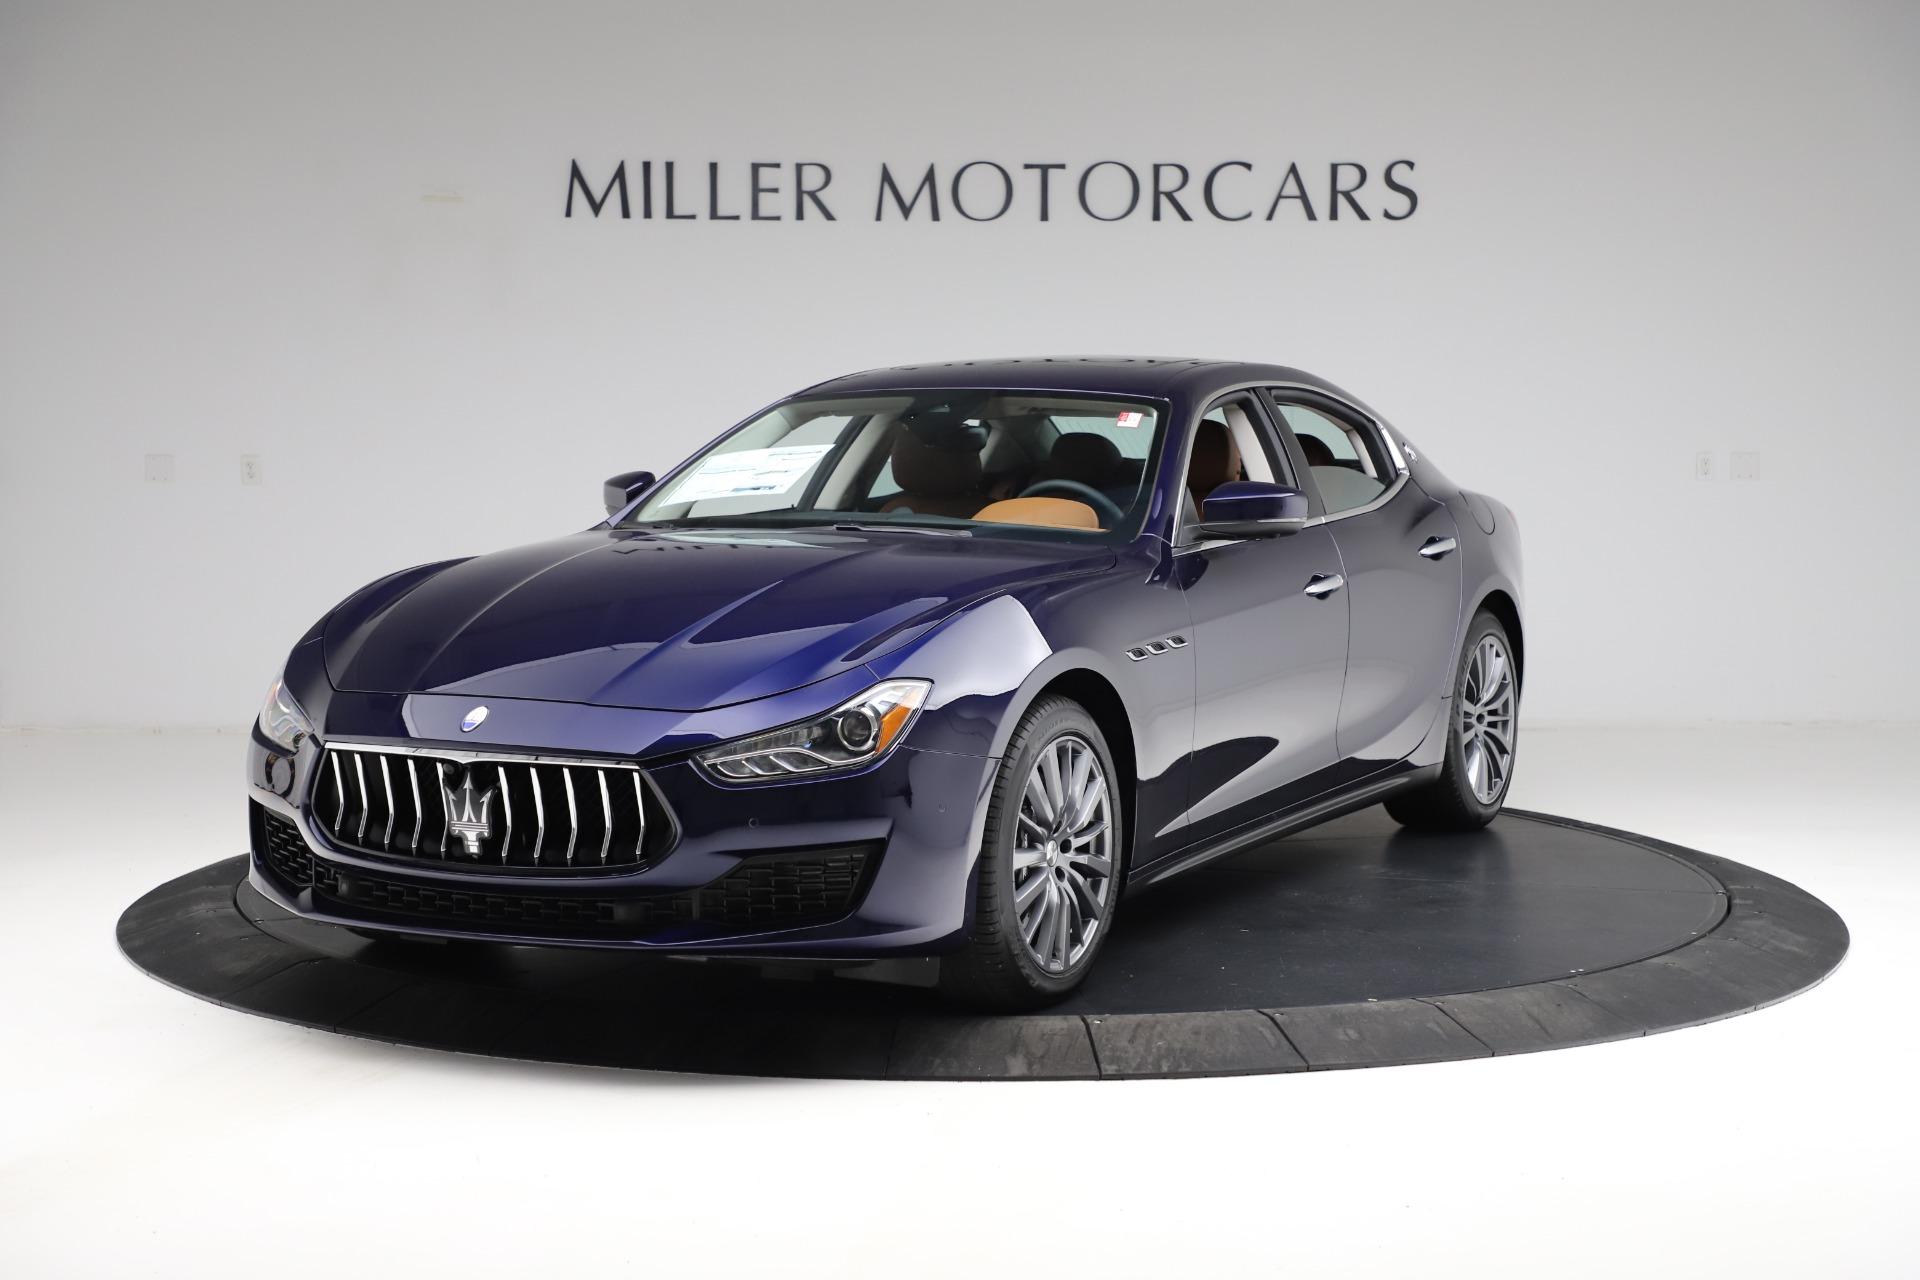 New 2021 Maserati Ghibli S Q4 for sale $86,954 at Alfa Romeo of Greenwich in Greenwich CT 06830 1